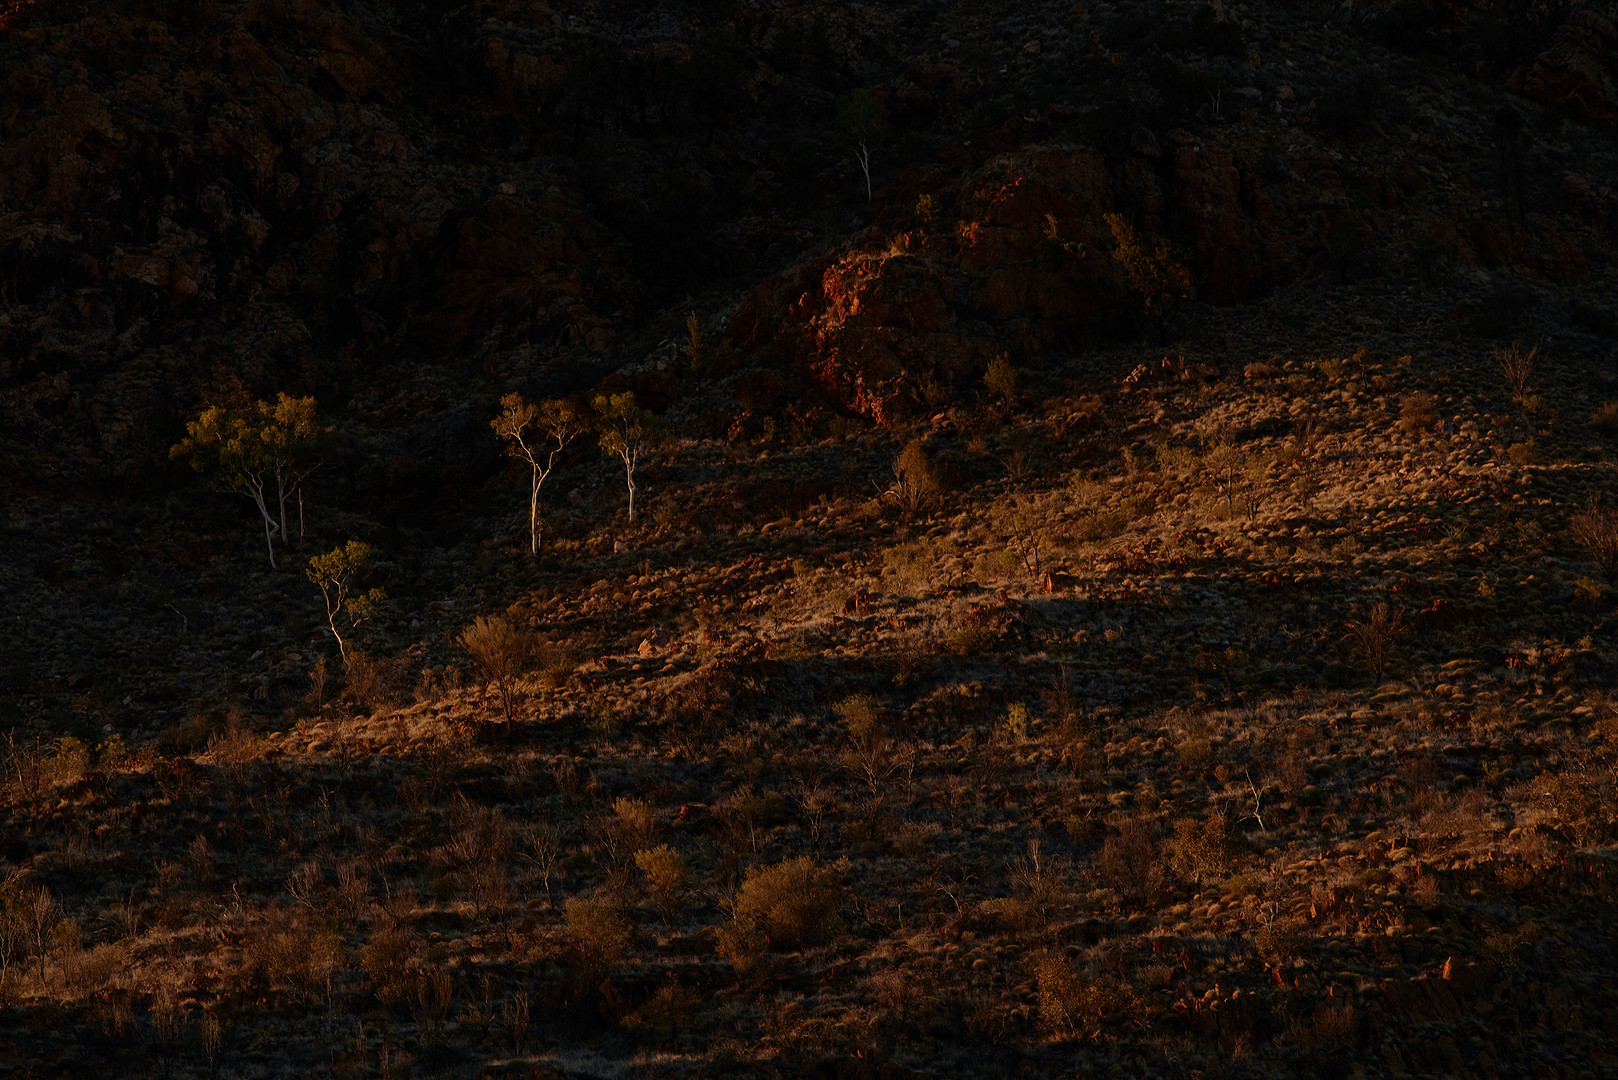 Damien-Kook-Photography-Landscape-01.jpg